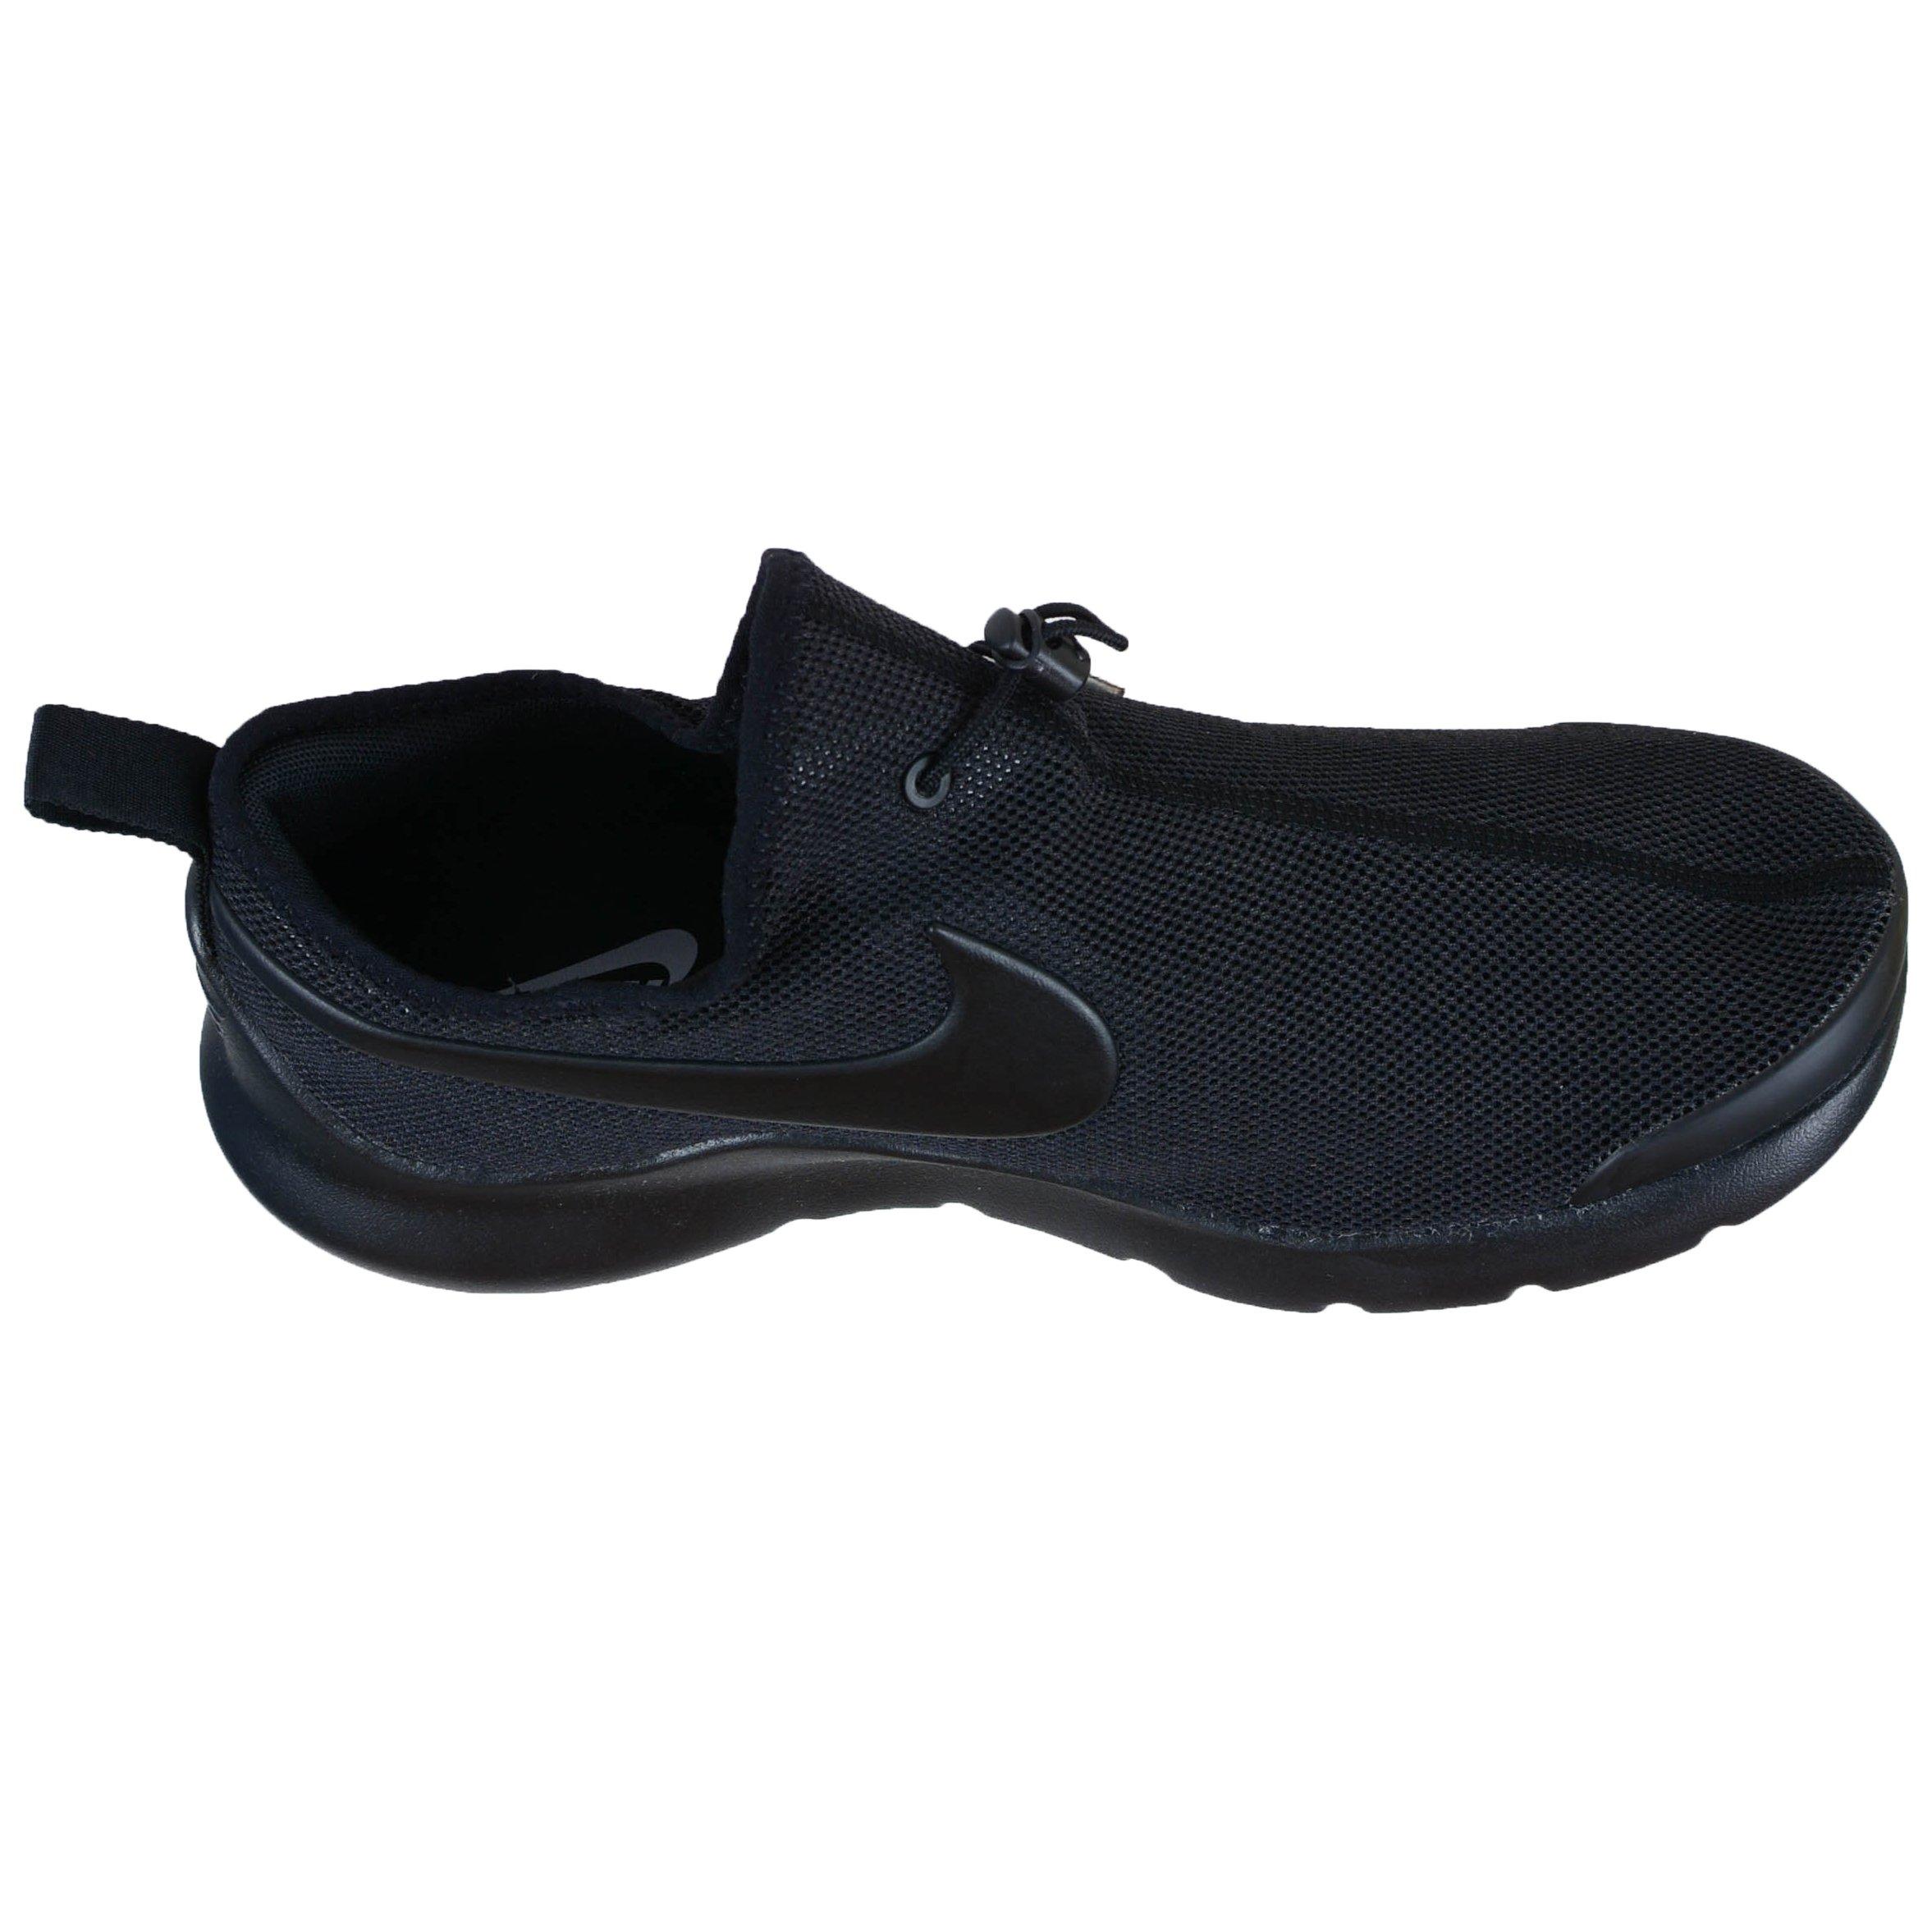 Uniti nera nera Uomo uomo da da 11 Scarpa SE bianca running Nike Stati 5 Aptare 1qg6x